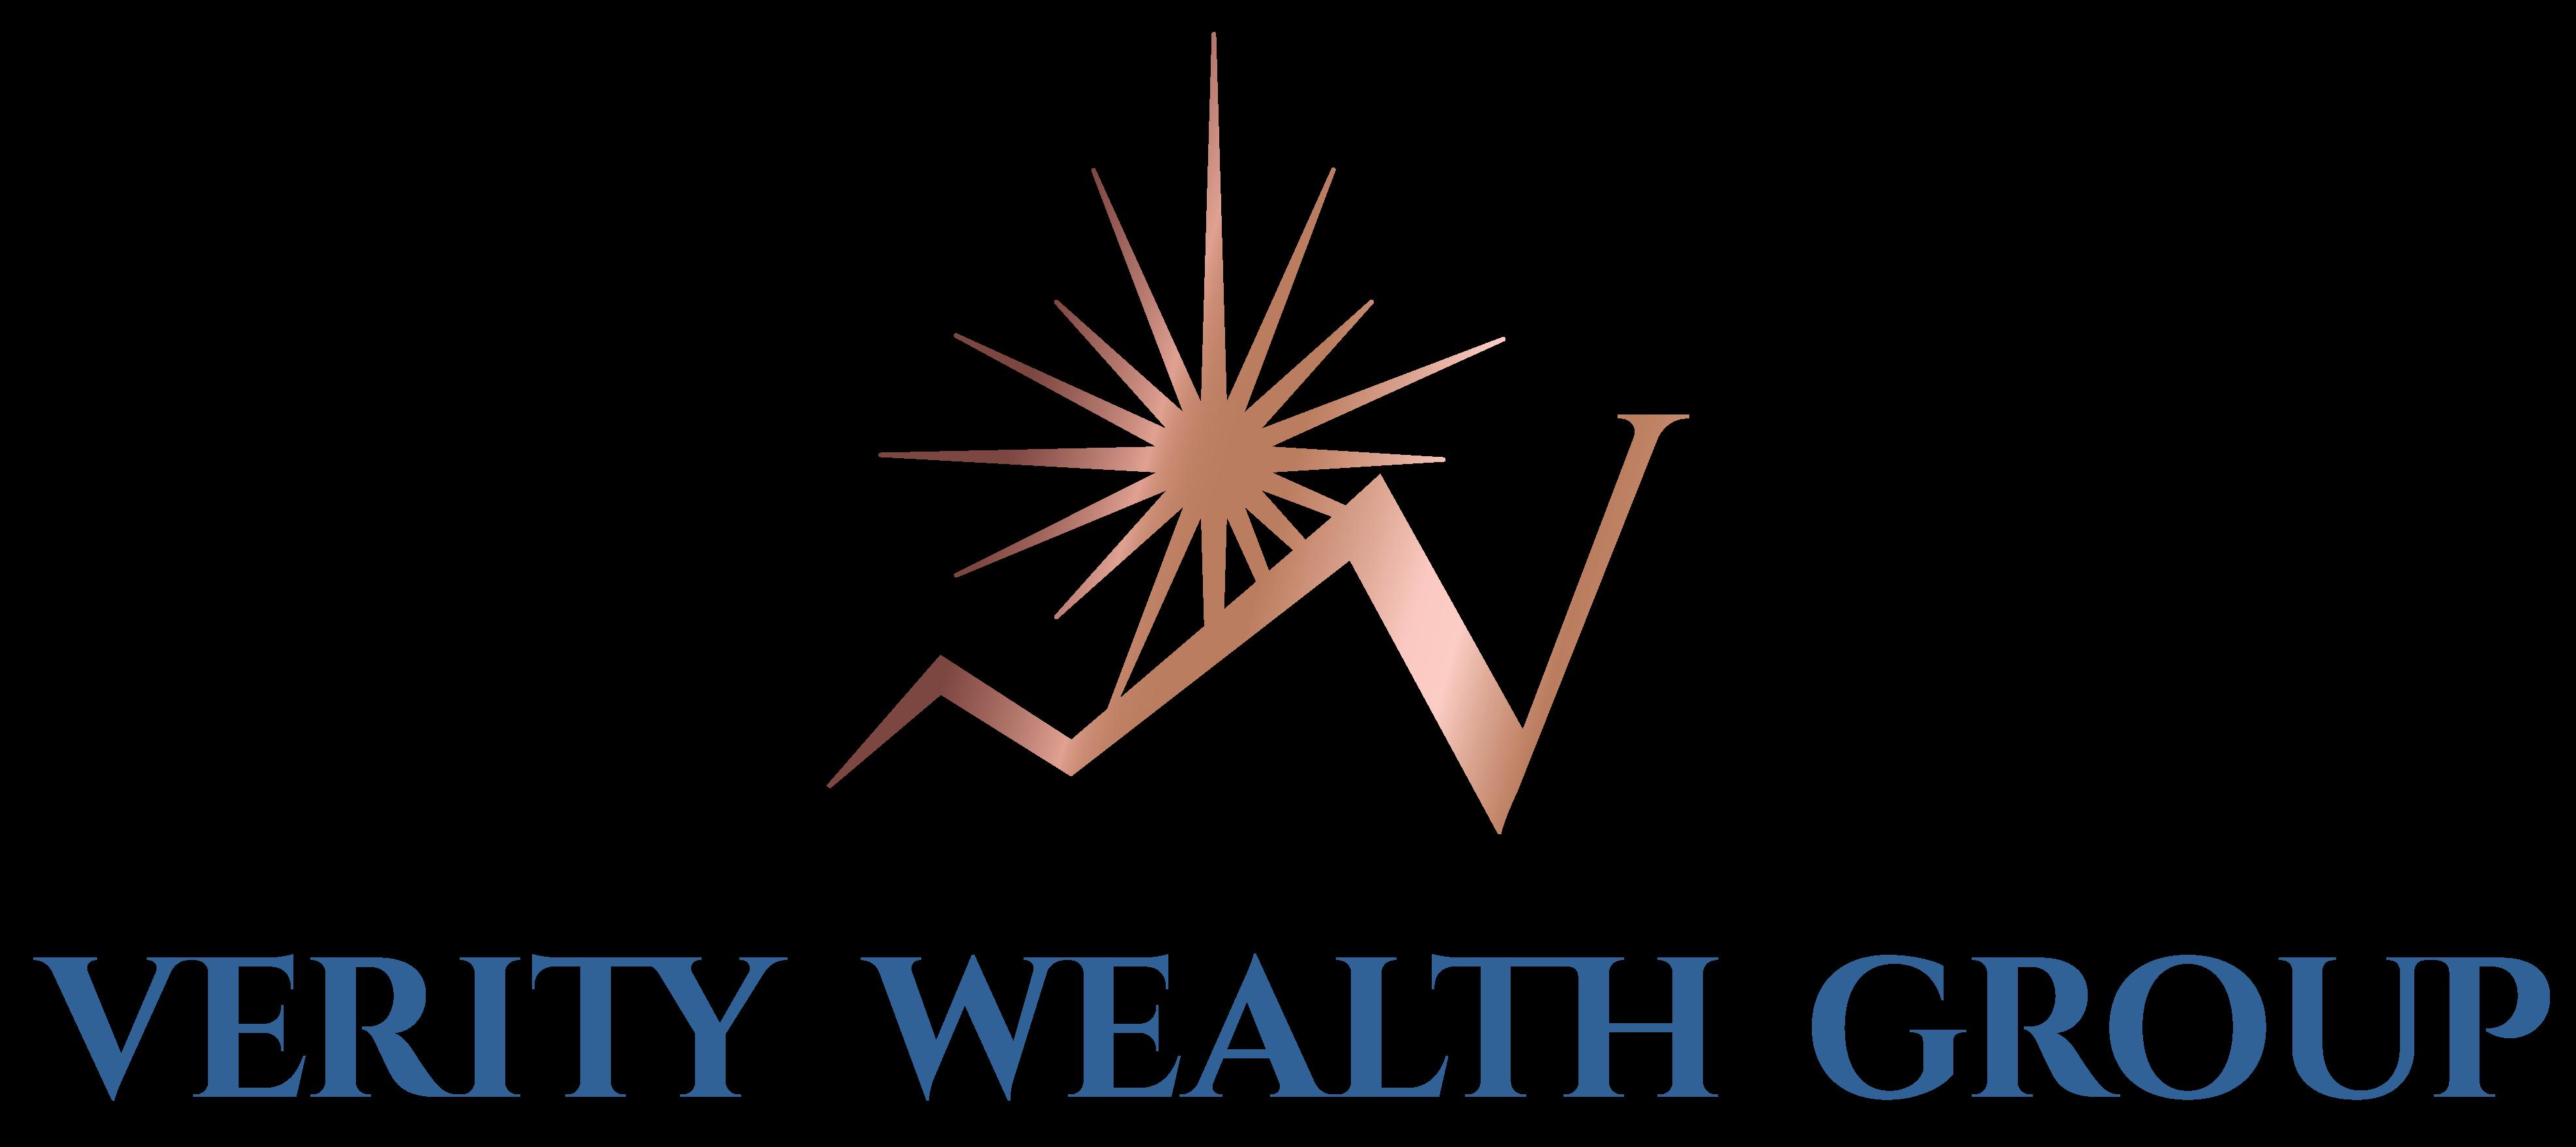 Verity Wealth Group